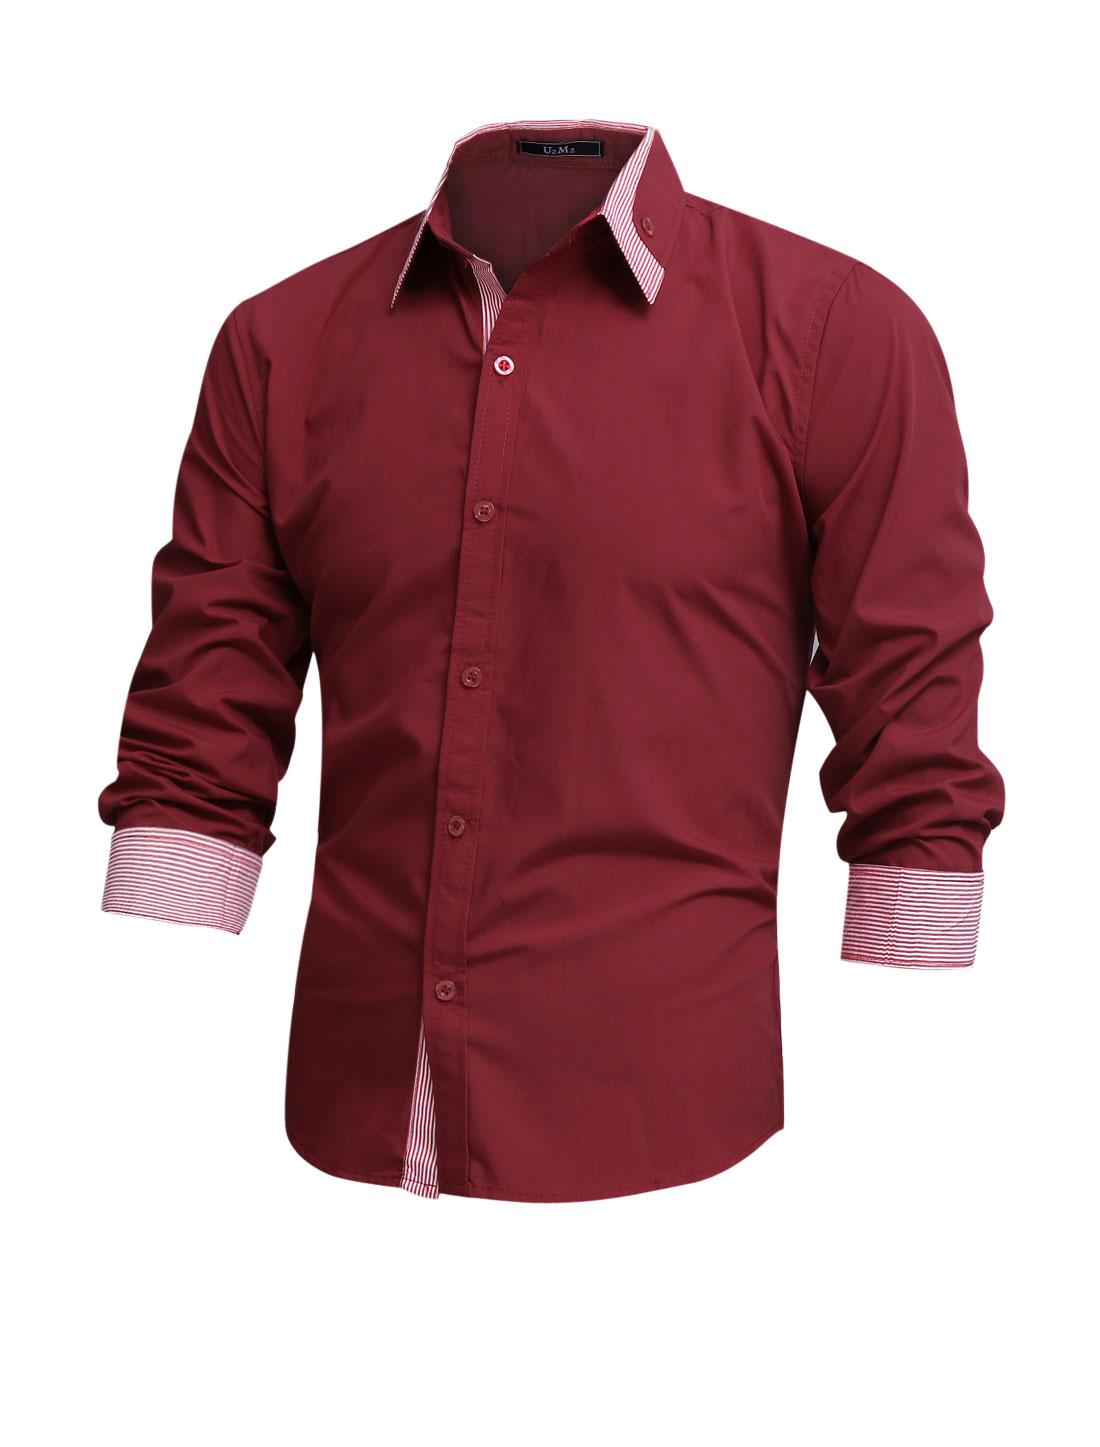 Men Long Sleeve Button Closure Button Docor Stripes Detail Shirt Burgundy M